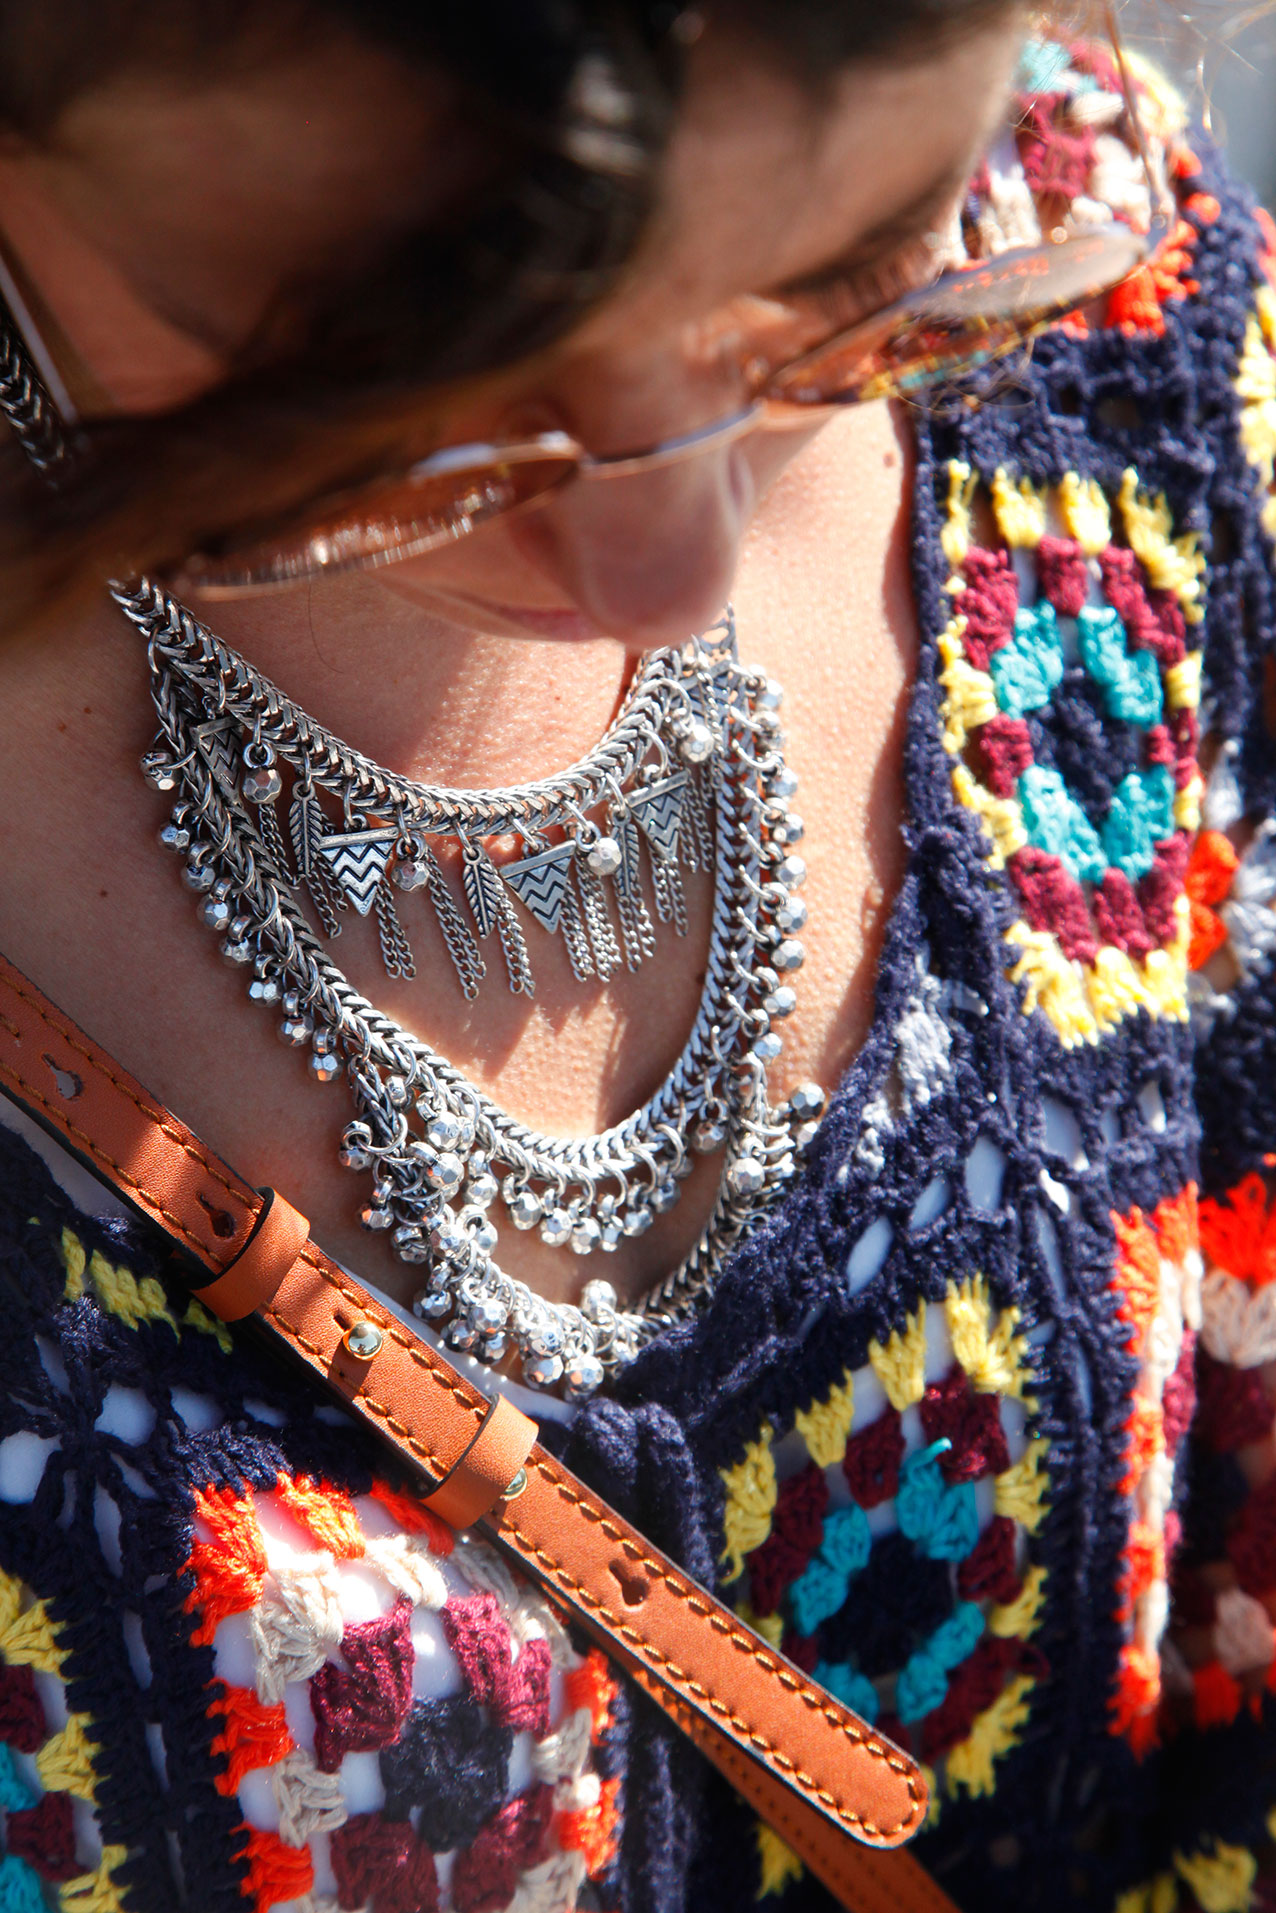 crochet_coat-spring_look-streetstyle-cool_lemonade